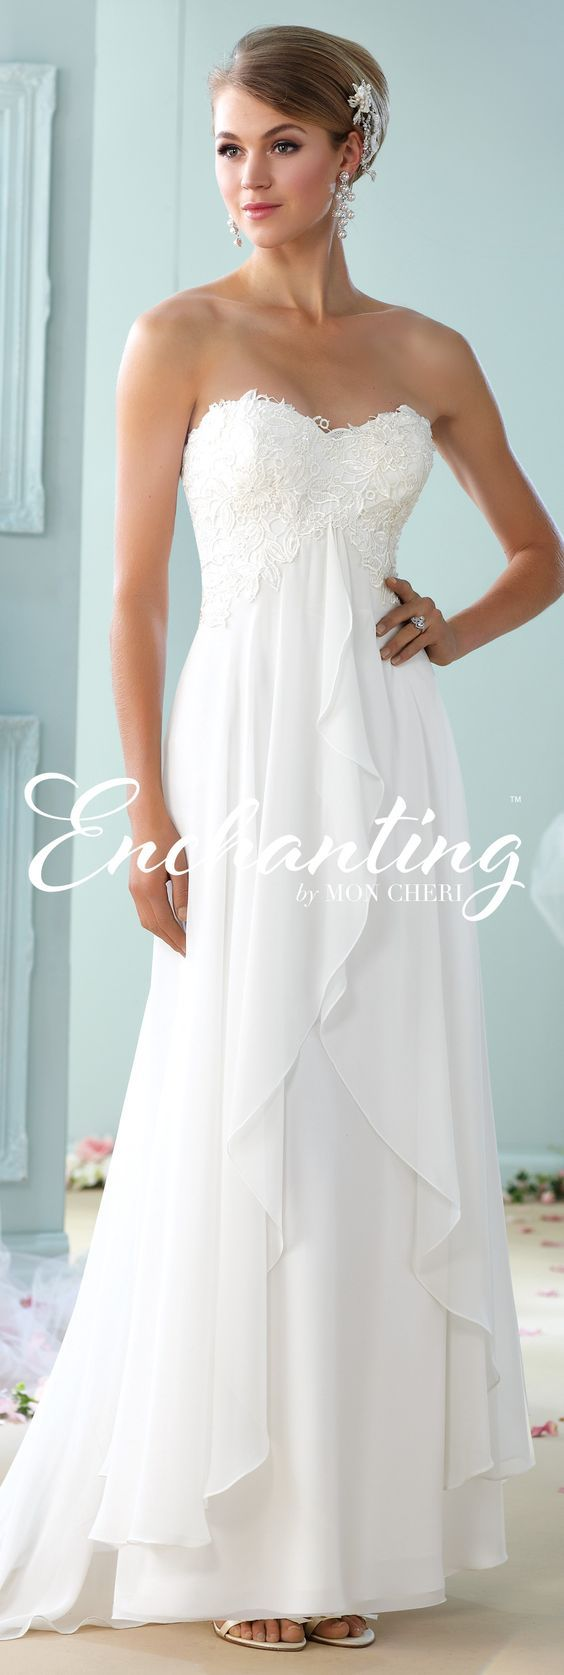 Enchanting by Mon Cheri - The Premiere Collection ~Style No. 215108 #chiffonweddingdresses